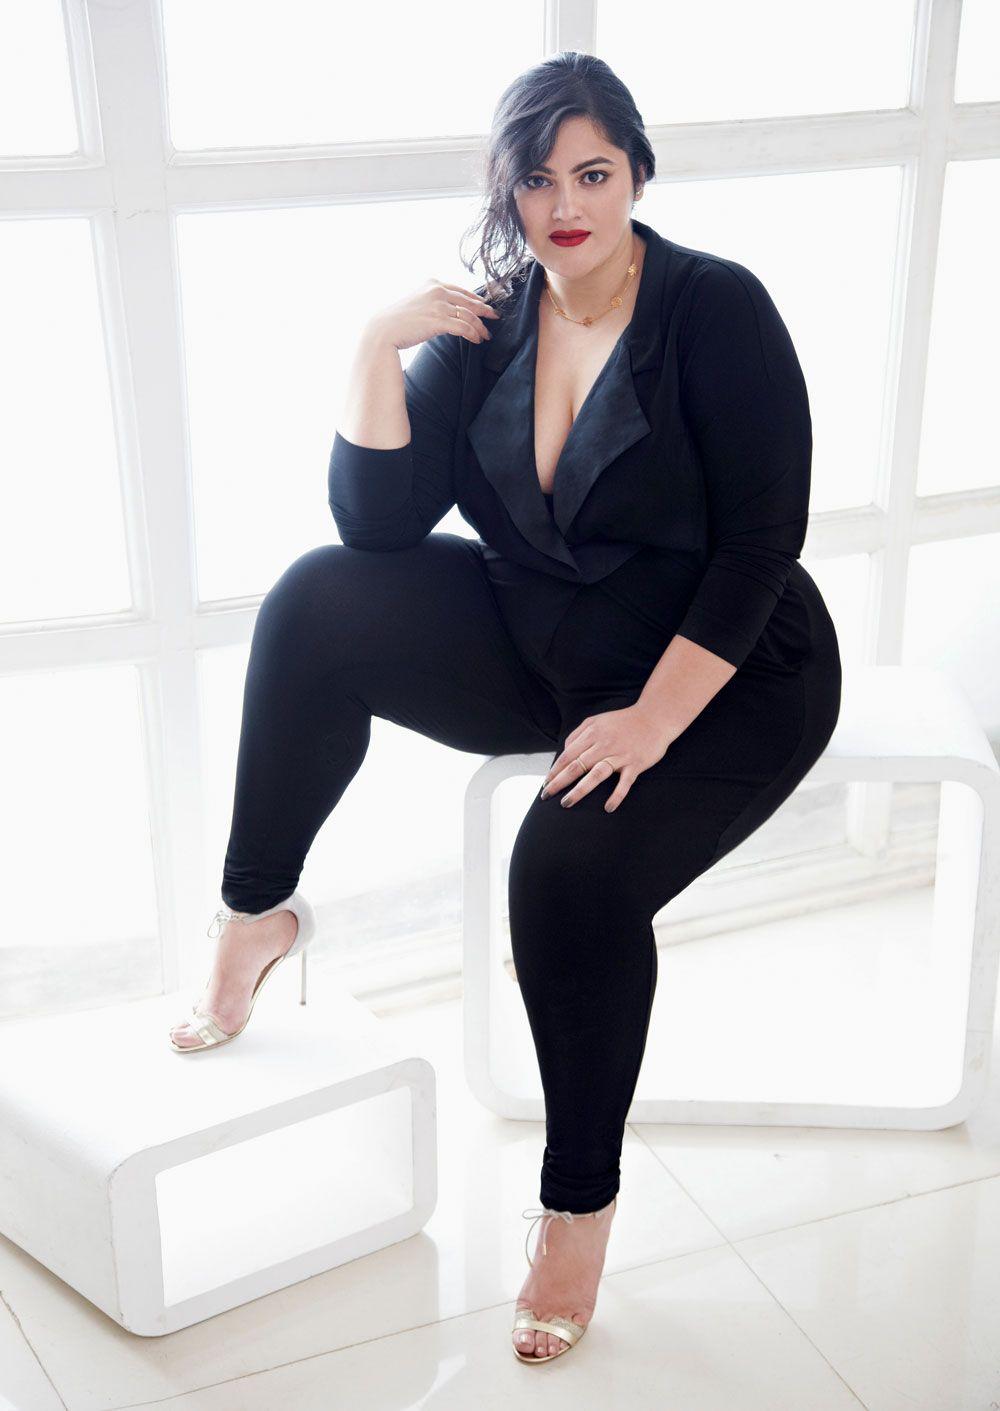 Sasha grey porno resimleri